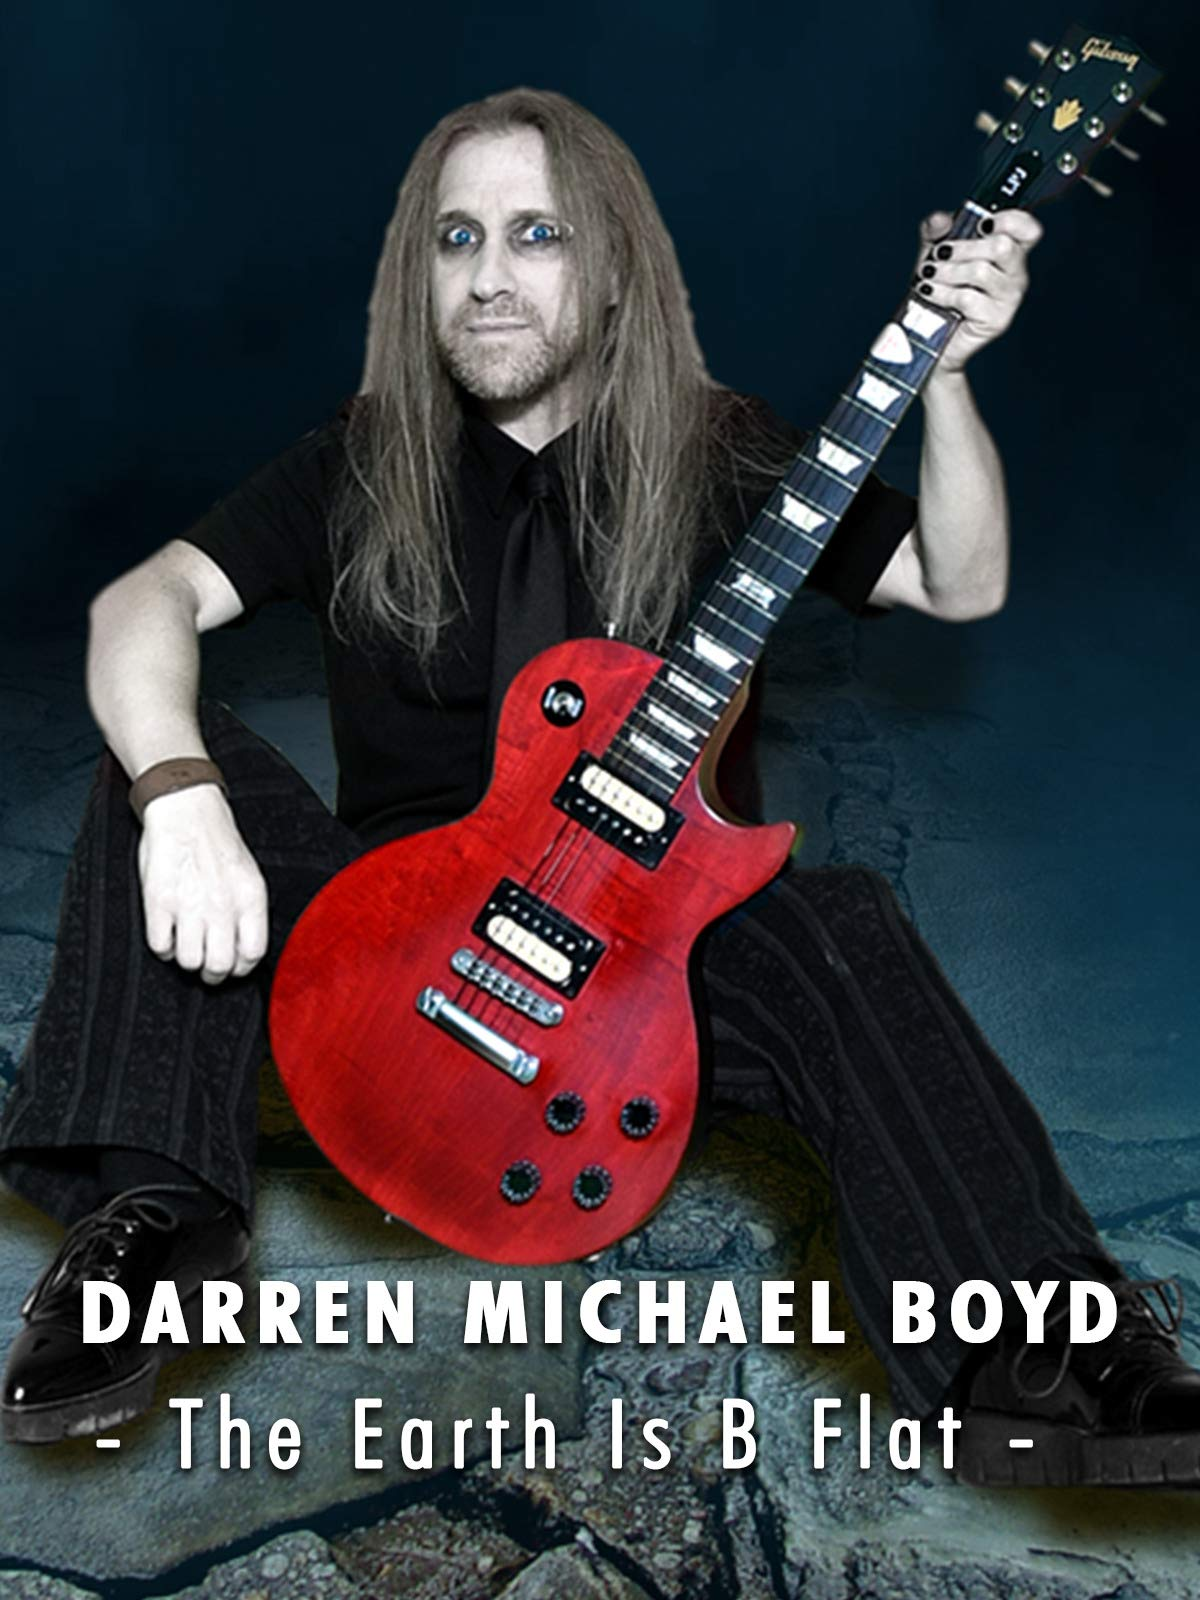 Darren Michael Boyd - The Earth Is B Flat